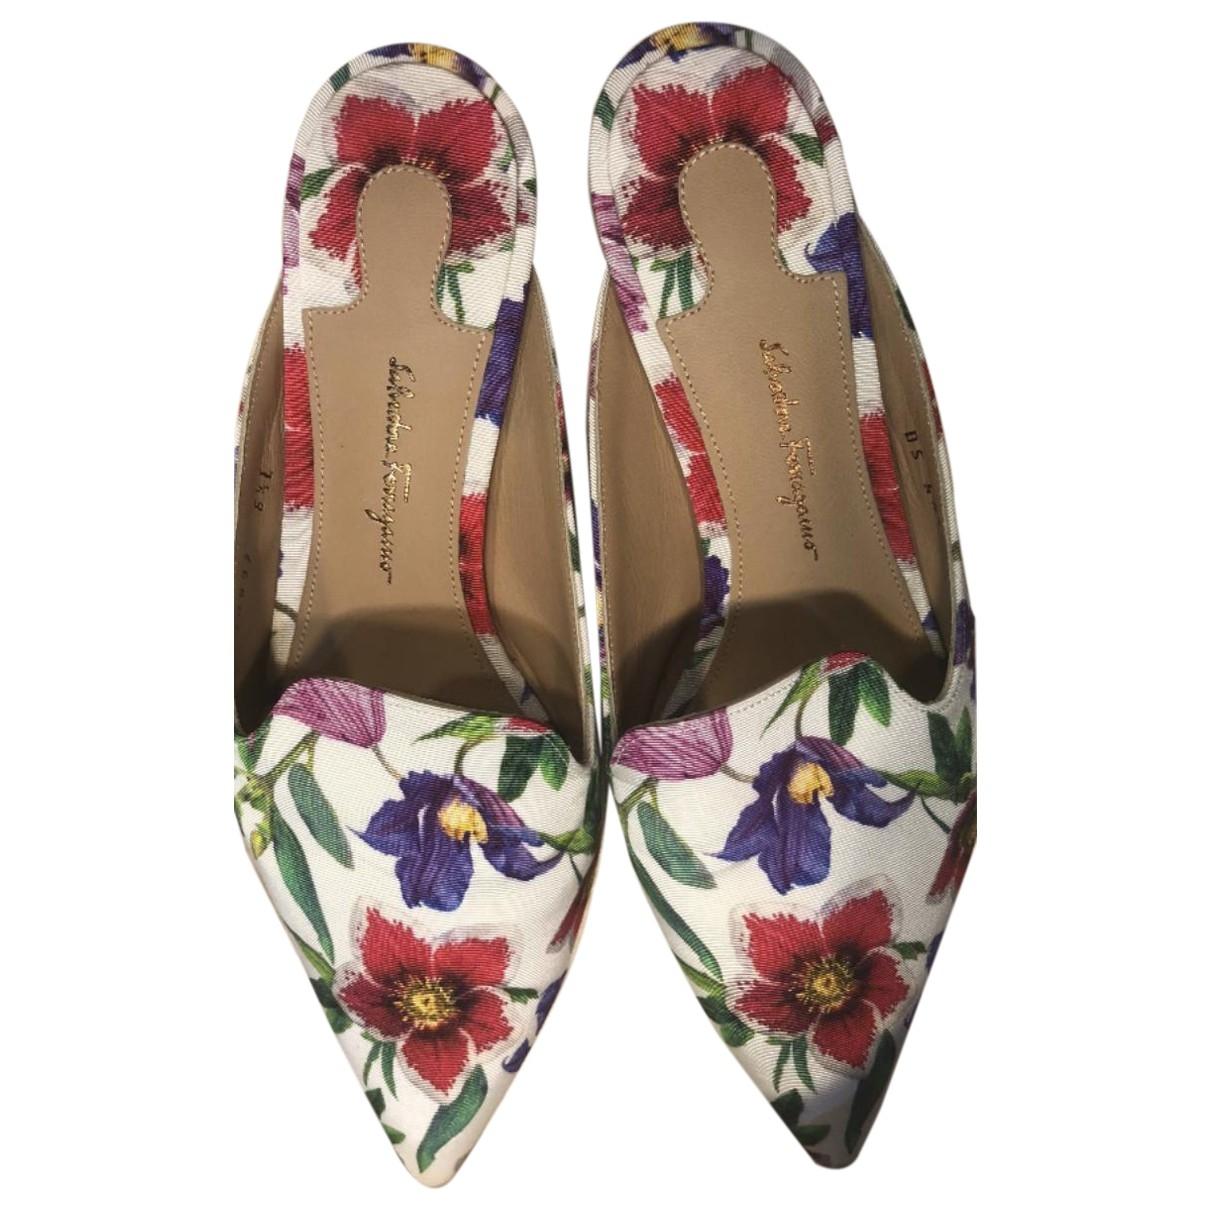 Salvatore Ferragamo \N Multicolour Cloth Mules & Clogs for Women 36.5 EU